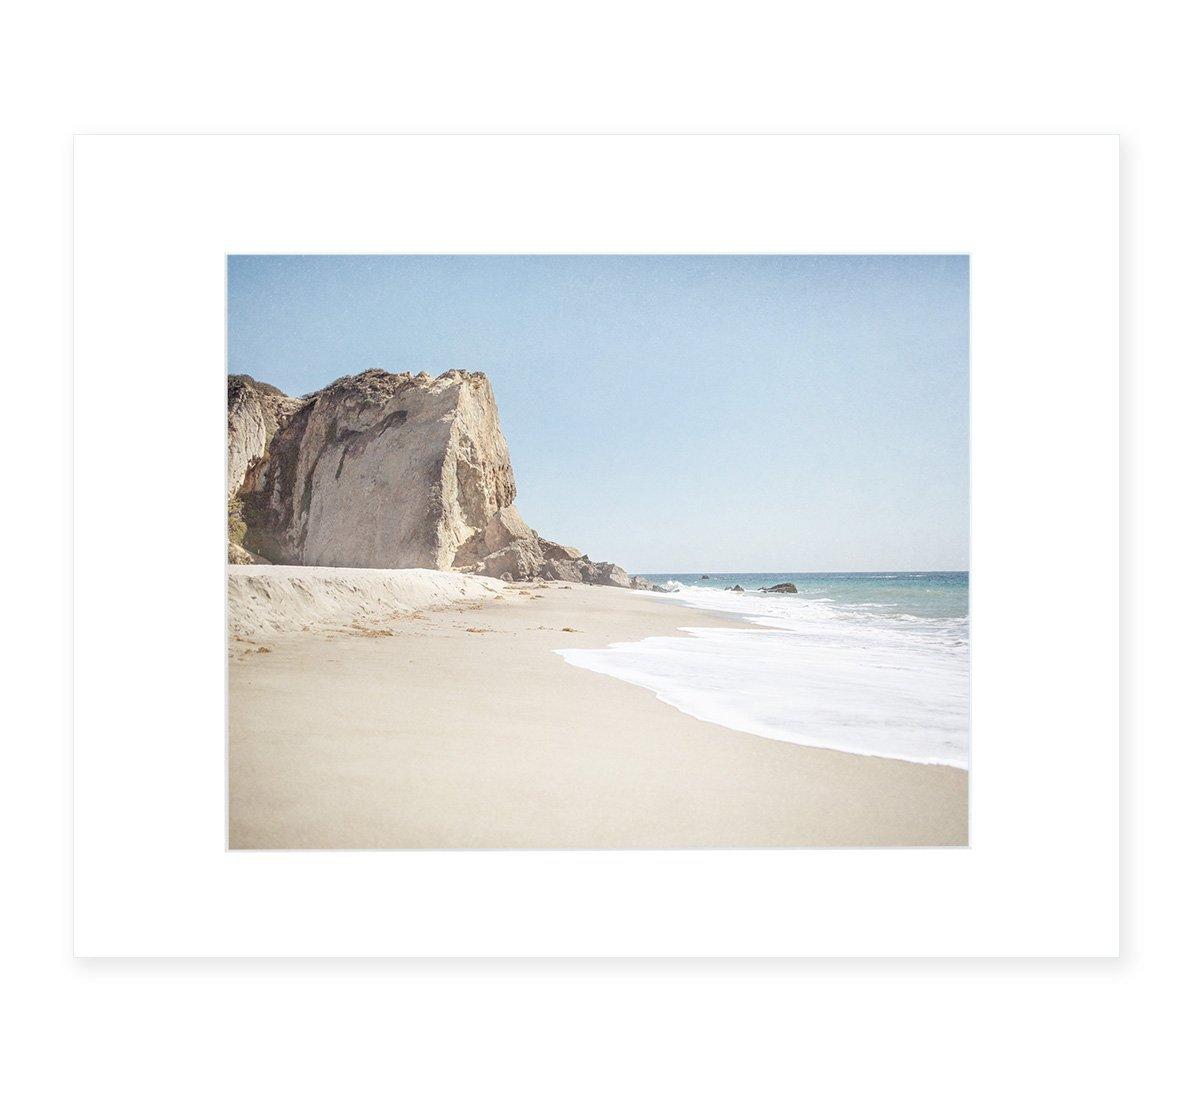 Malibu Wall Art, California Landscape Beach Picture, Coastal Seascape Decor, 8x10 Matted Photographic Print (fits 11x14 frame) 'Point Dume'